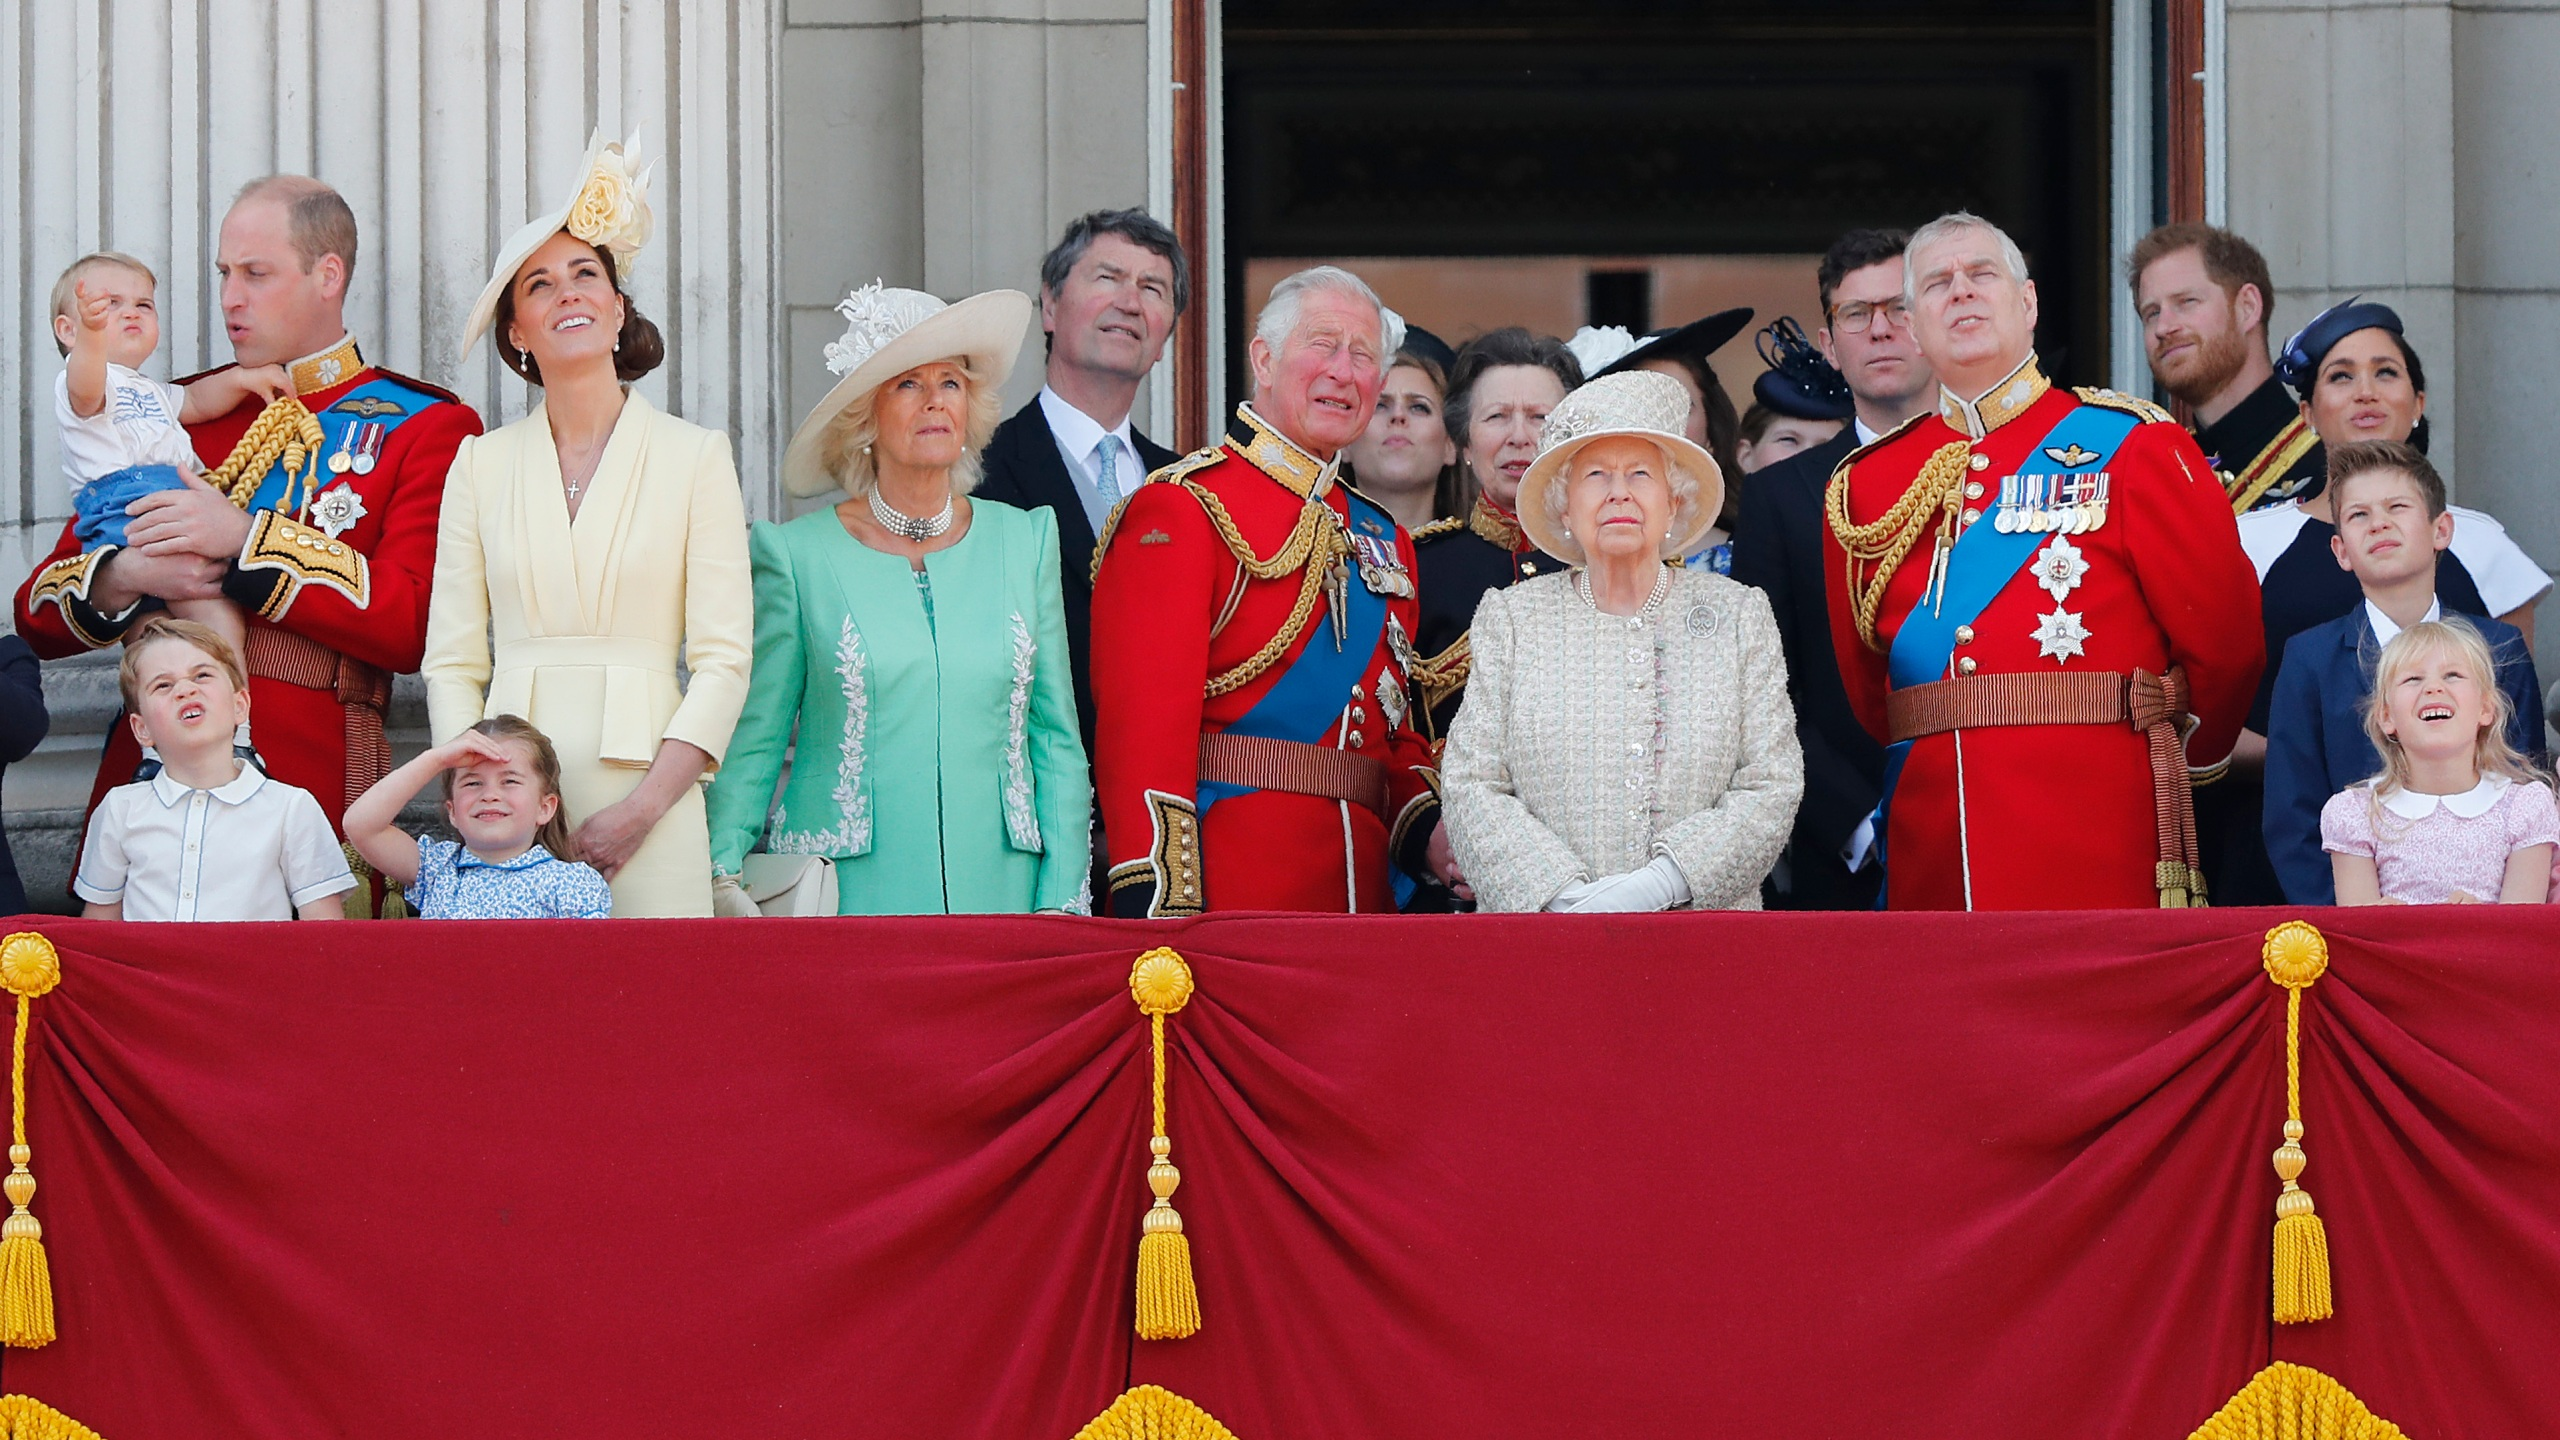 Britain_Royals_96300-159532.jpg31360259